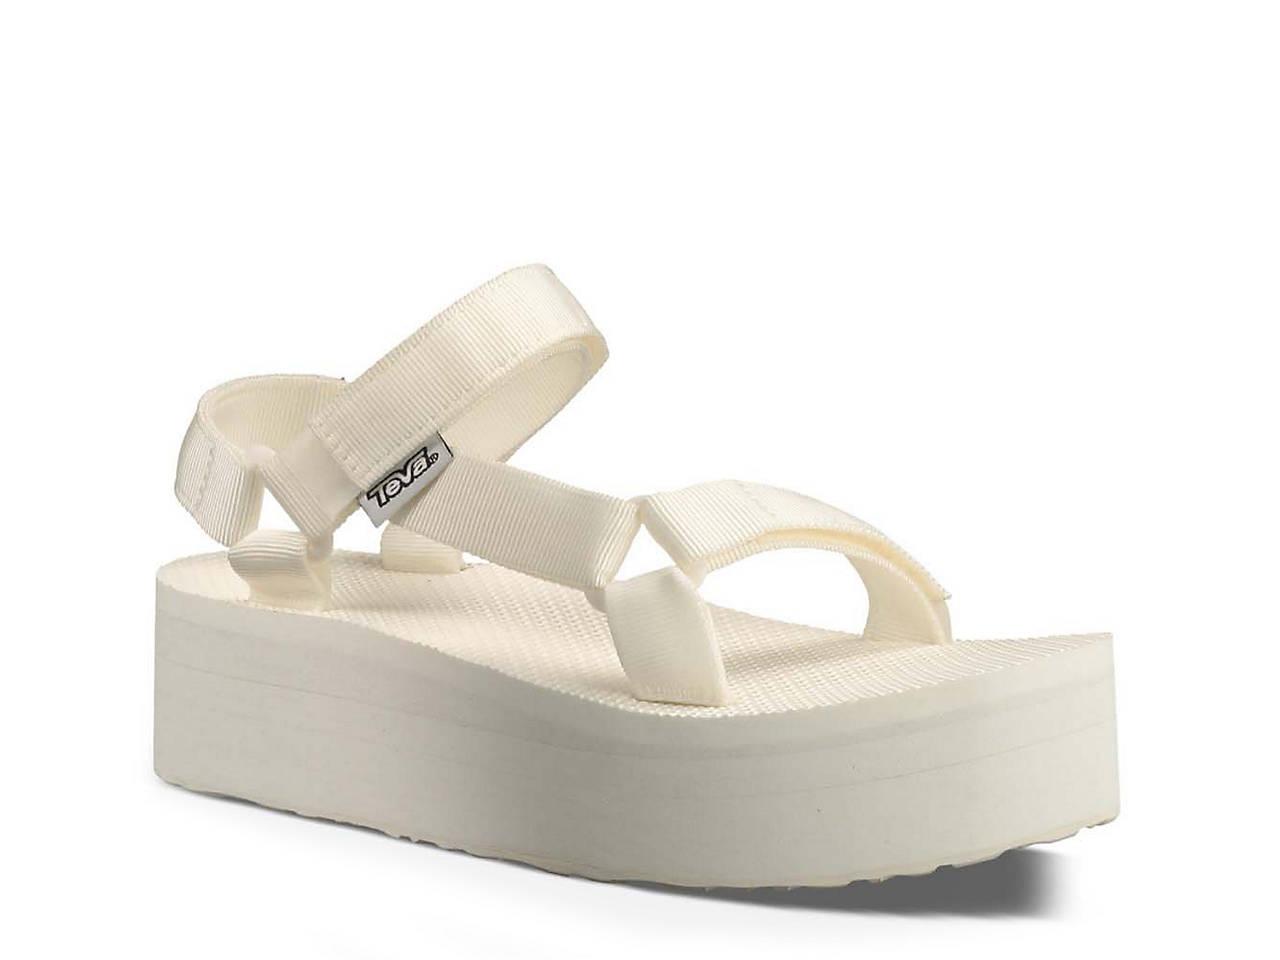 c50457b3316 Teva Flatform Universal Sandal Women s Shoes